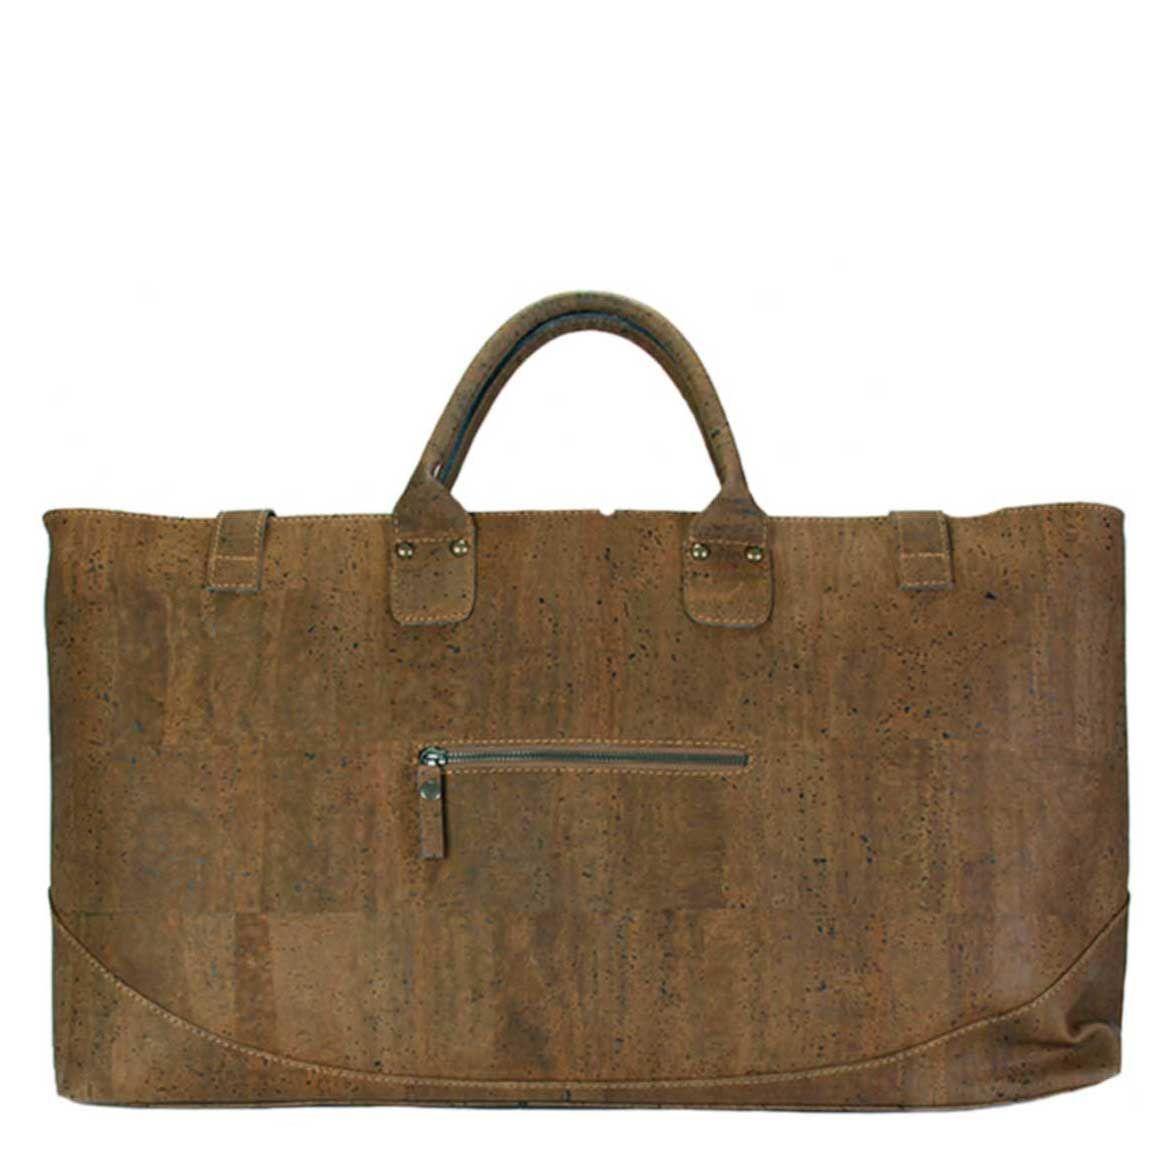 Cork travel/overnight bag, lightweight, refined & stylish